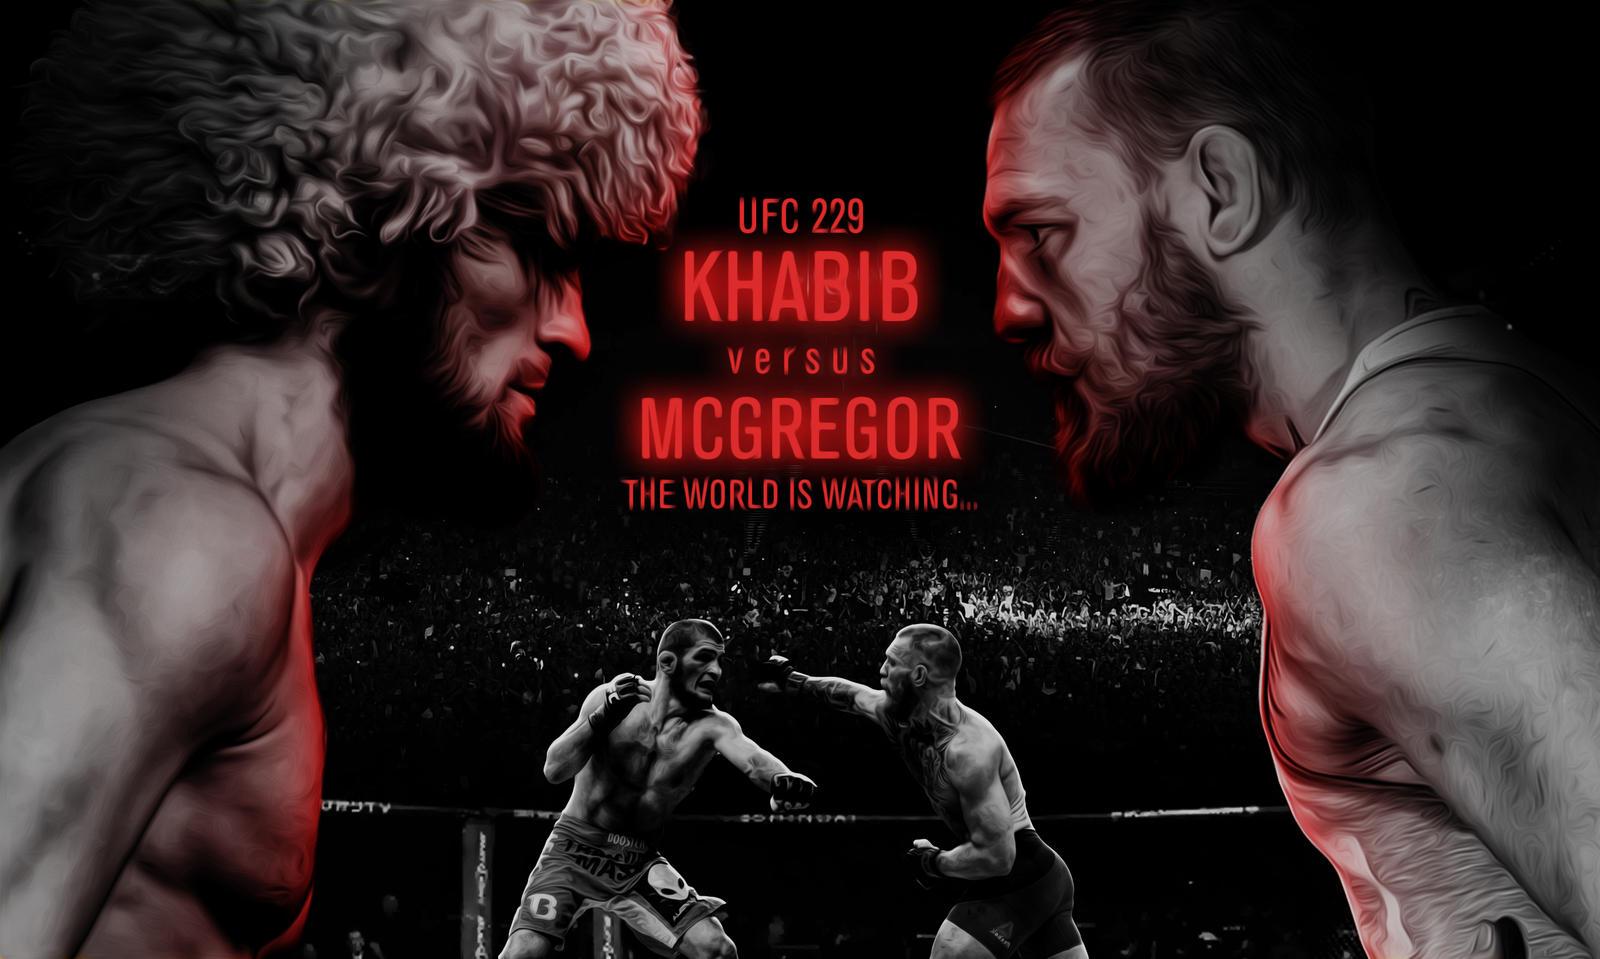 Khabib vs Mcgregor UFC 229 Wallpaper by ZeroPlus123 1600x959